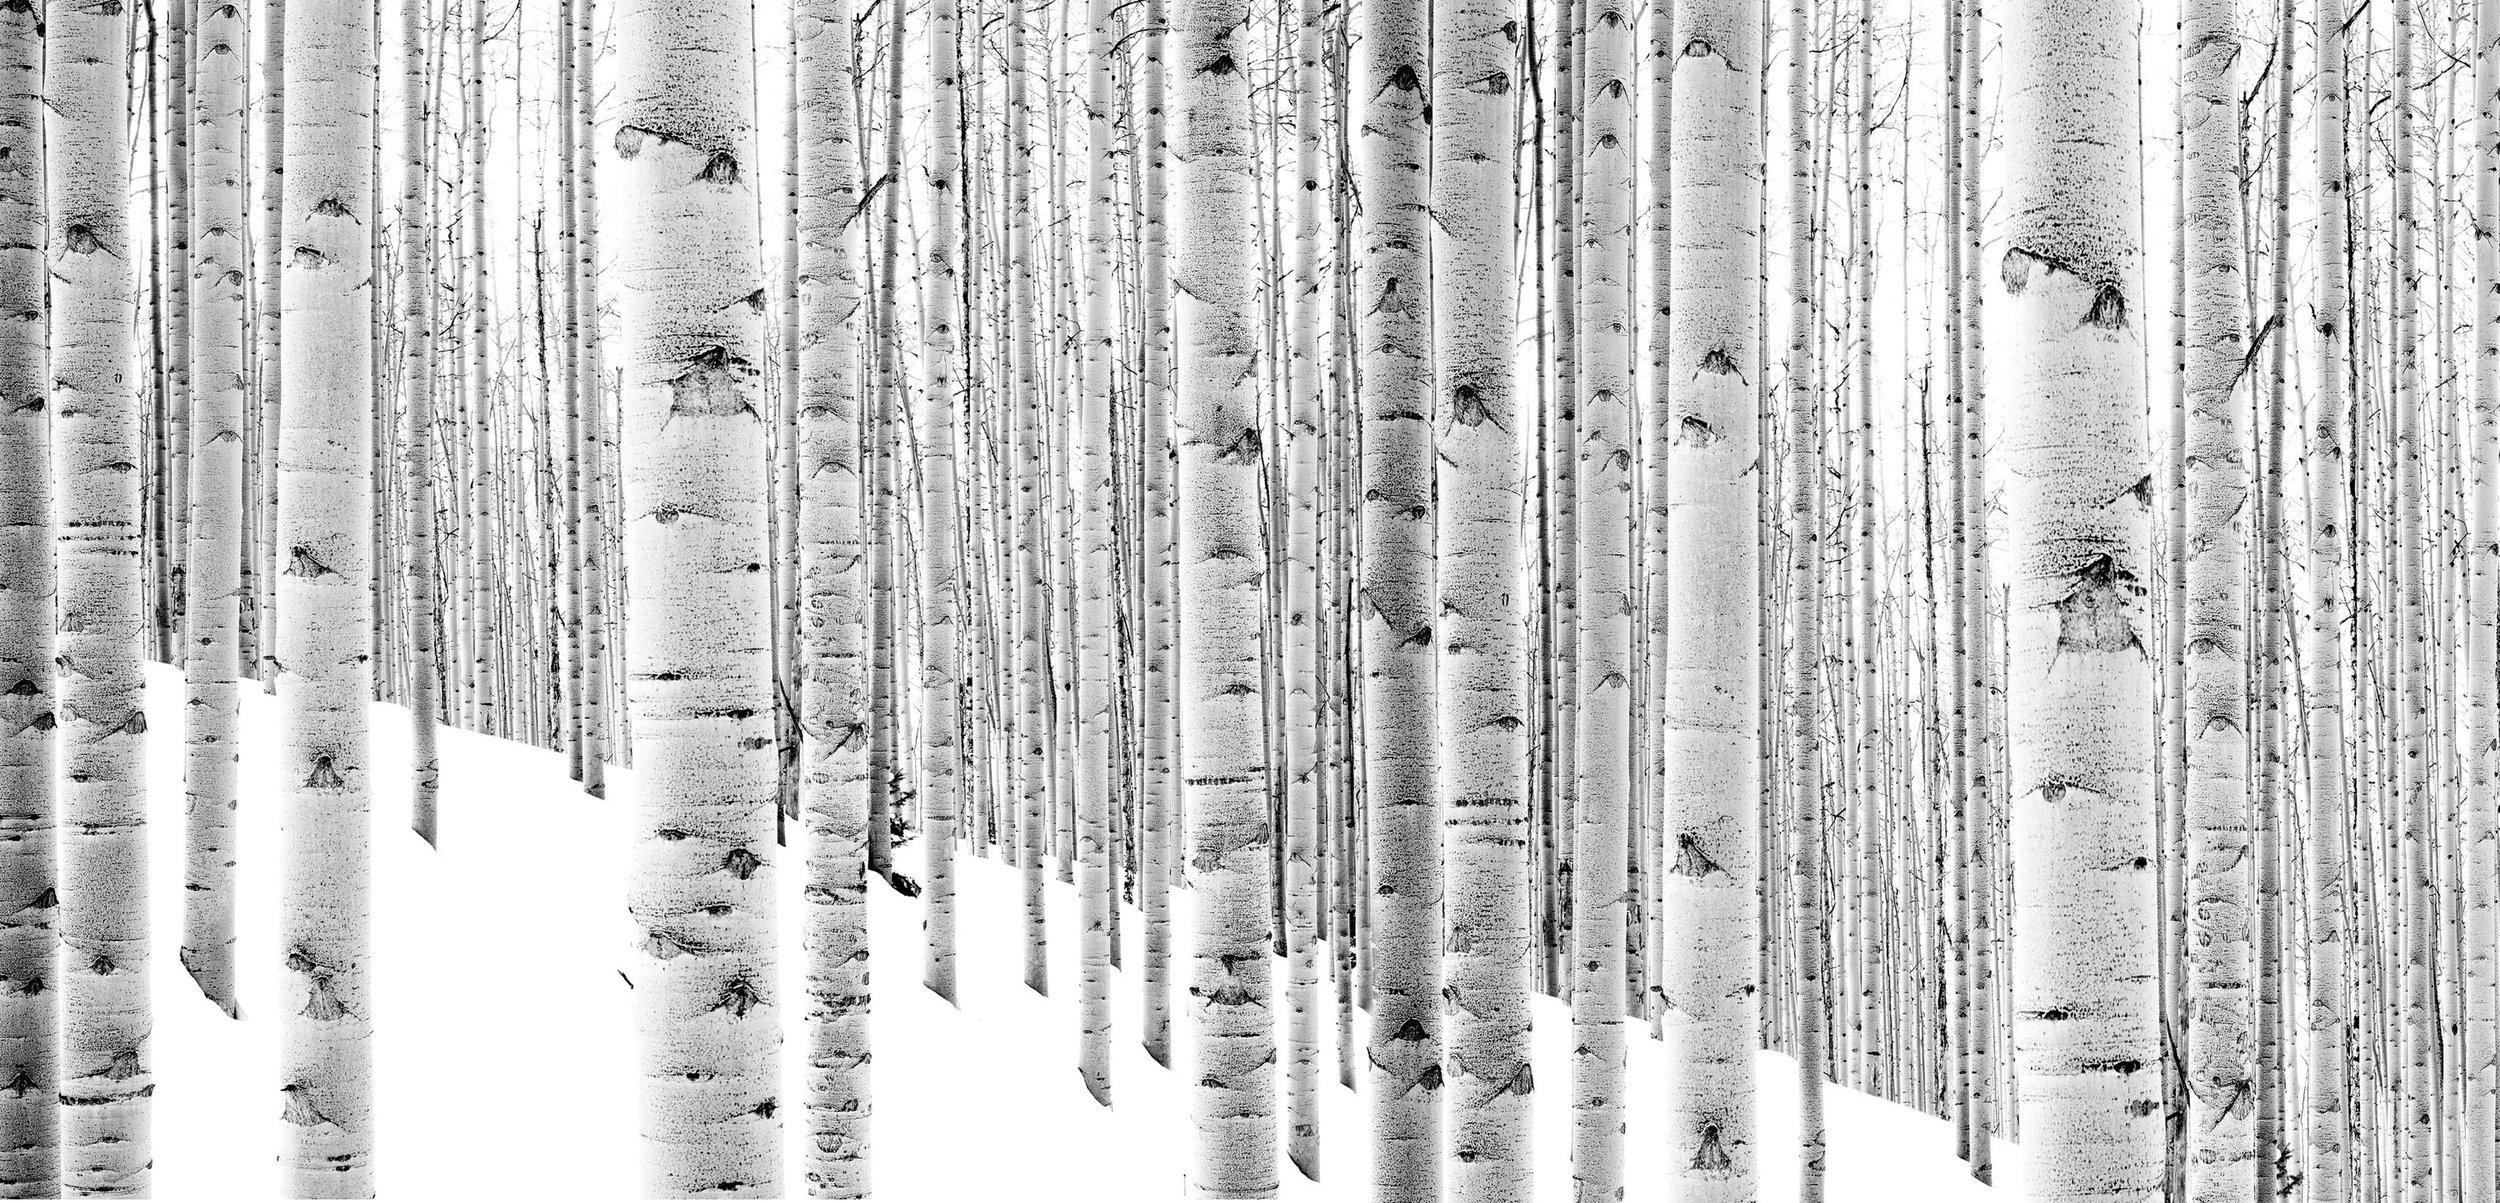 Endless Forest,  by Shelli Breidenbach